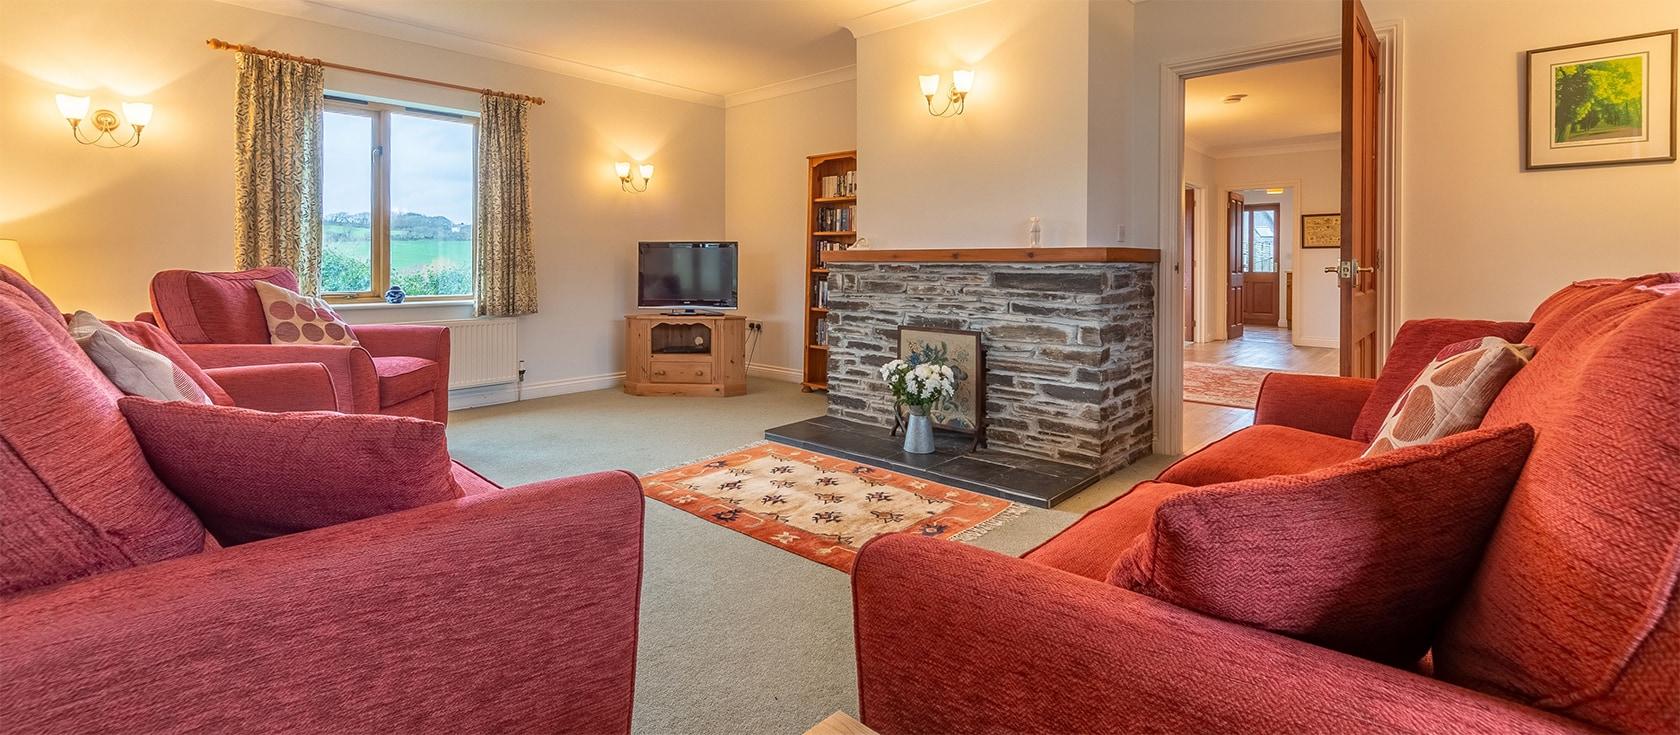 September Cottage, Roserrow, Polzeath